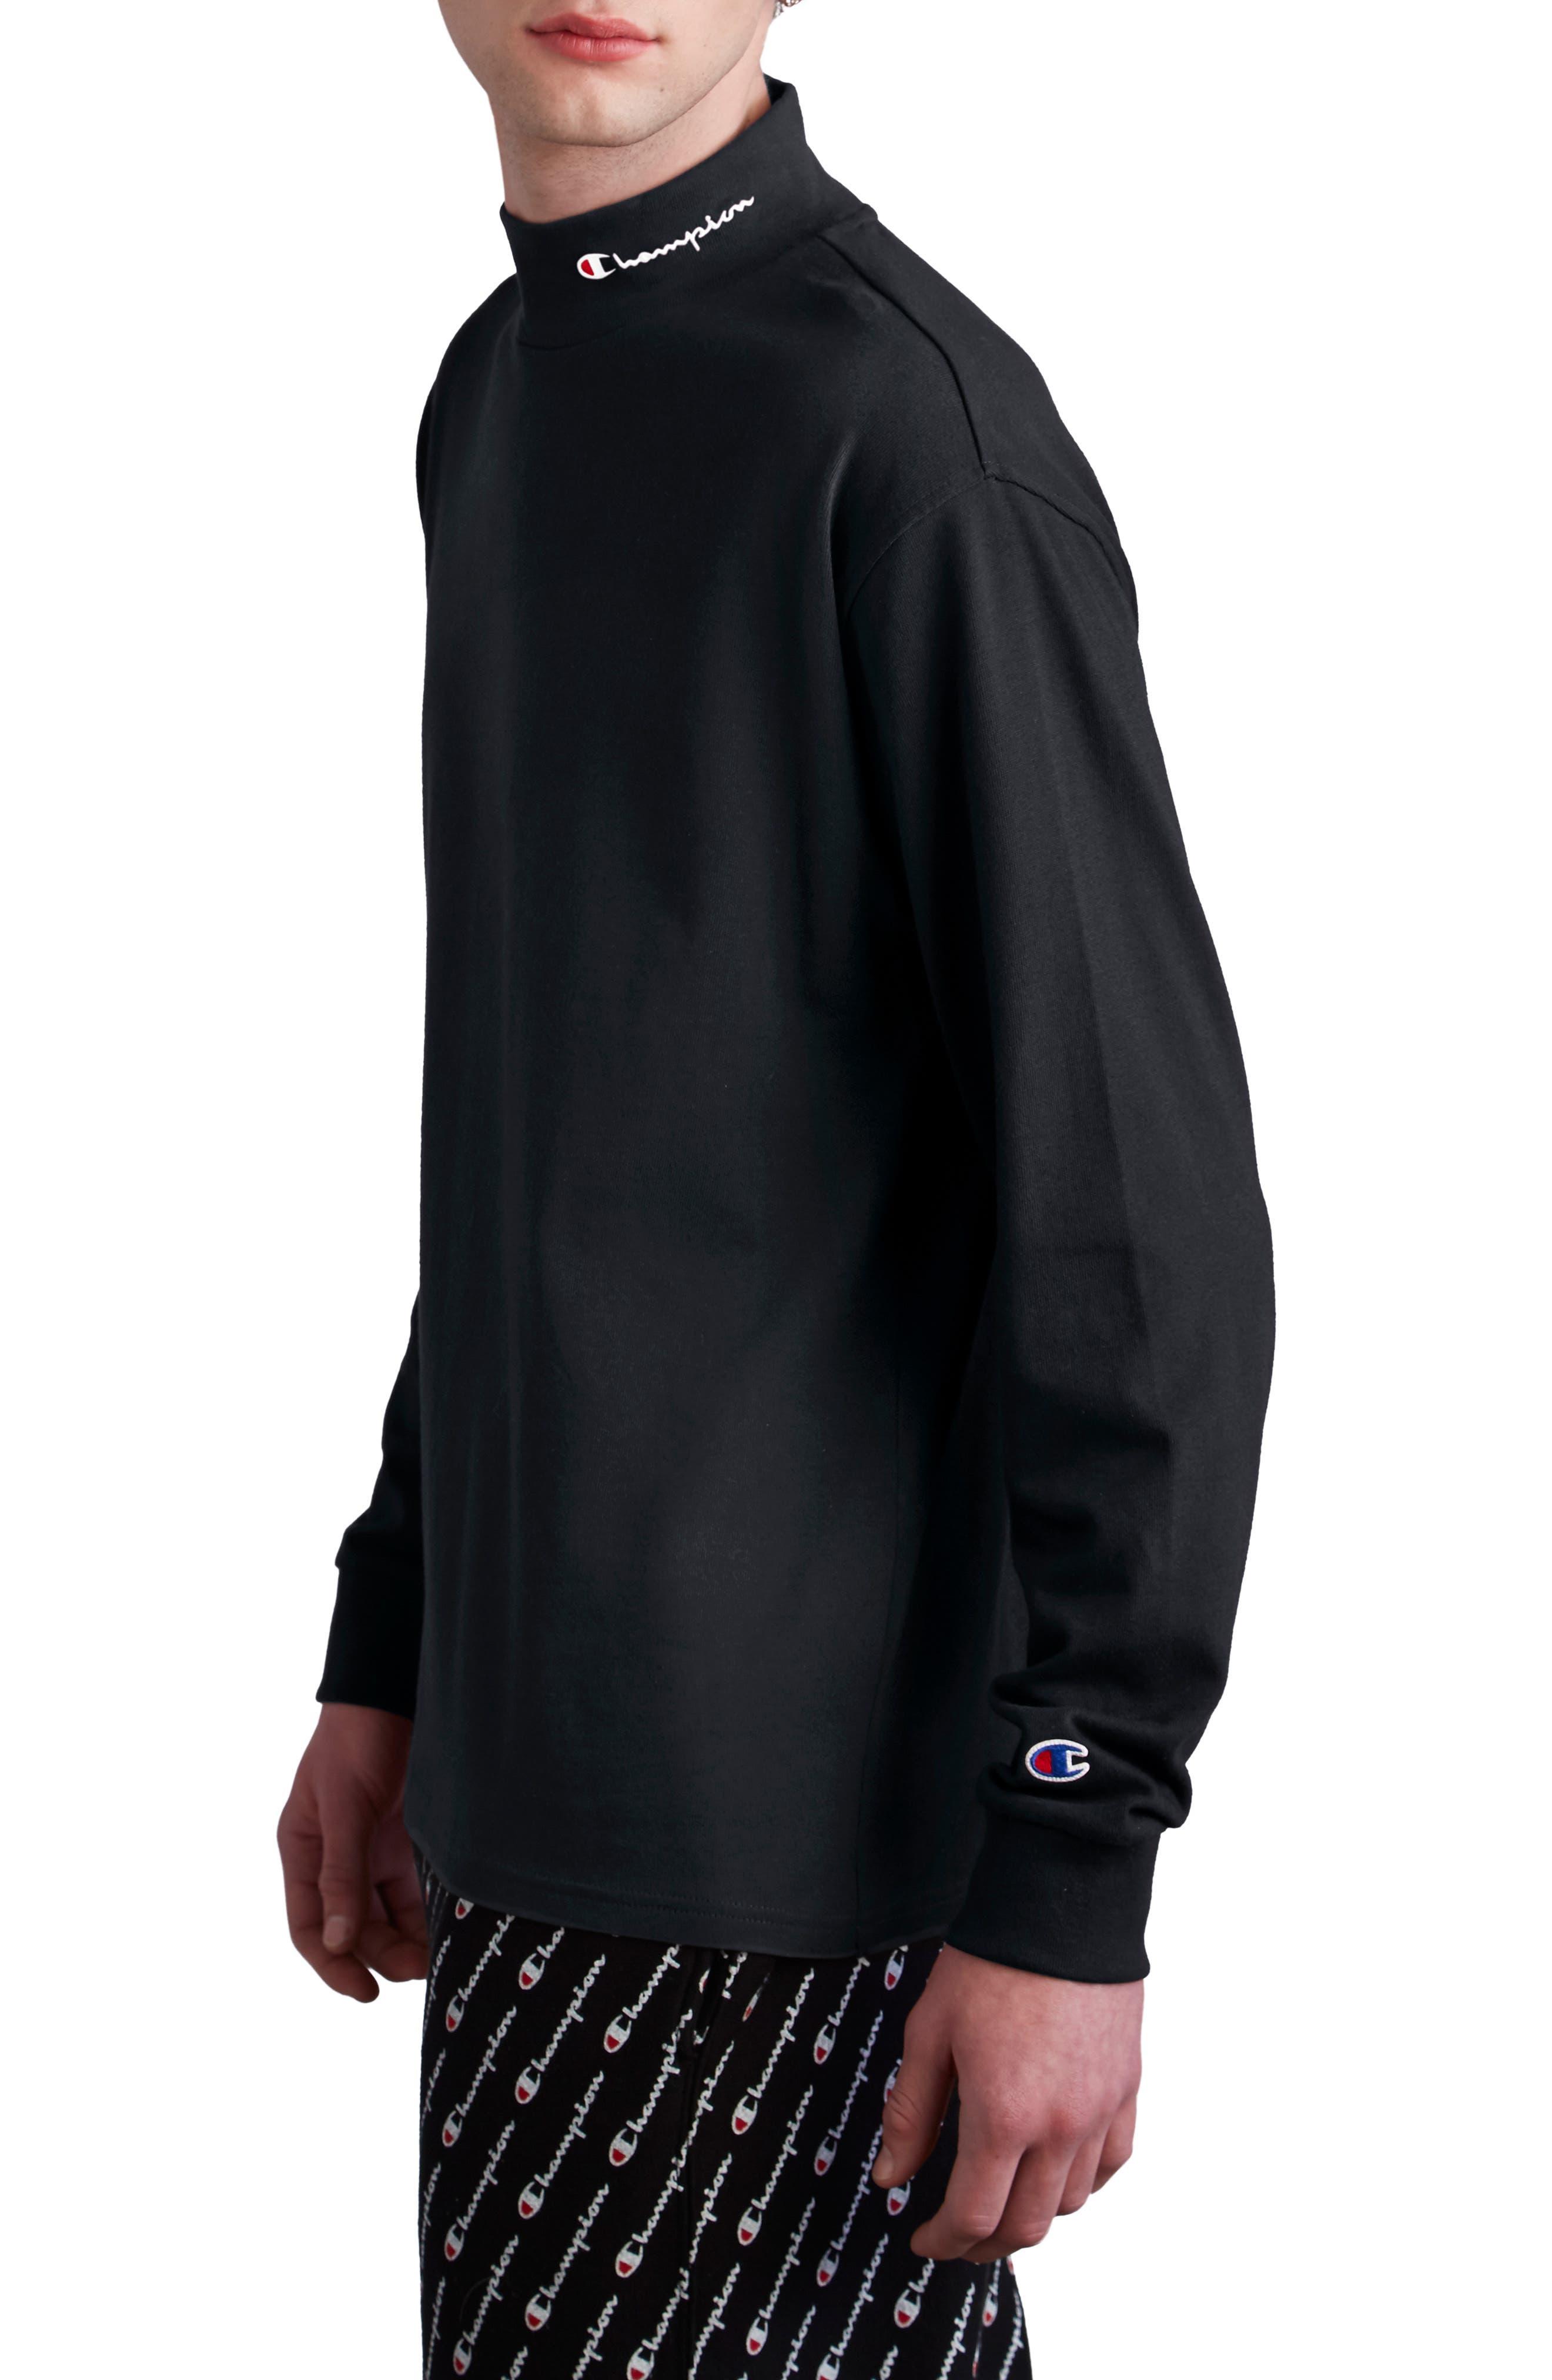 CHAMPION, Heavyweight Mock Neck T-Shirt, Alternate thumbnail 3, color, BLACK